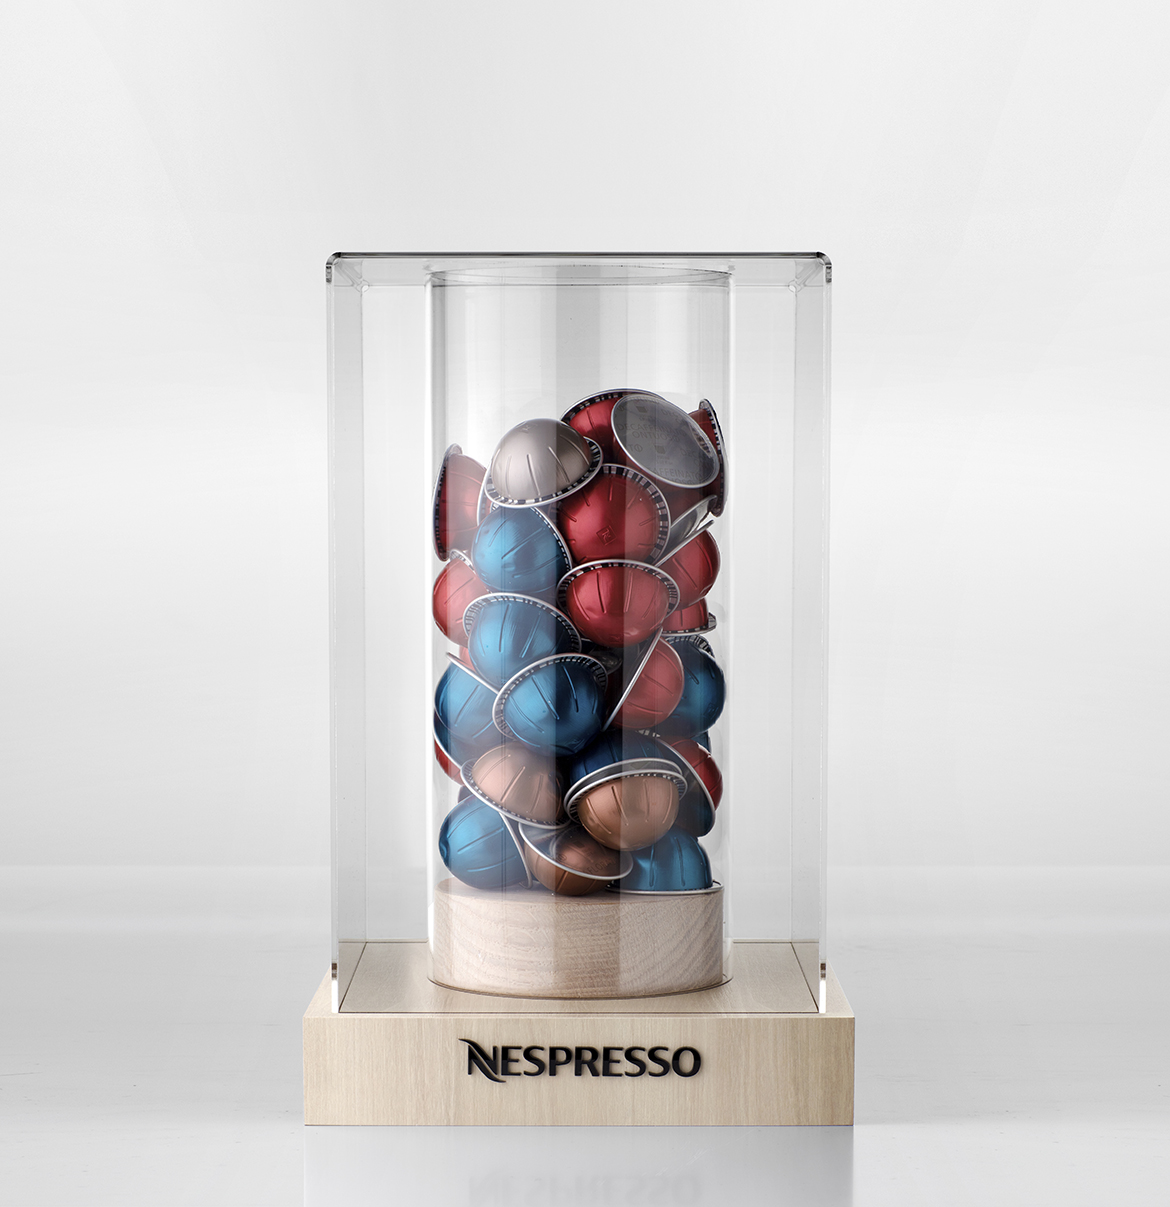 Nespresso_display case1